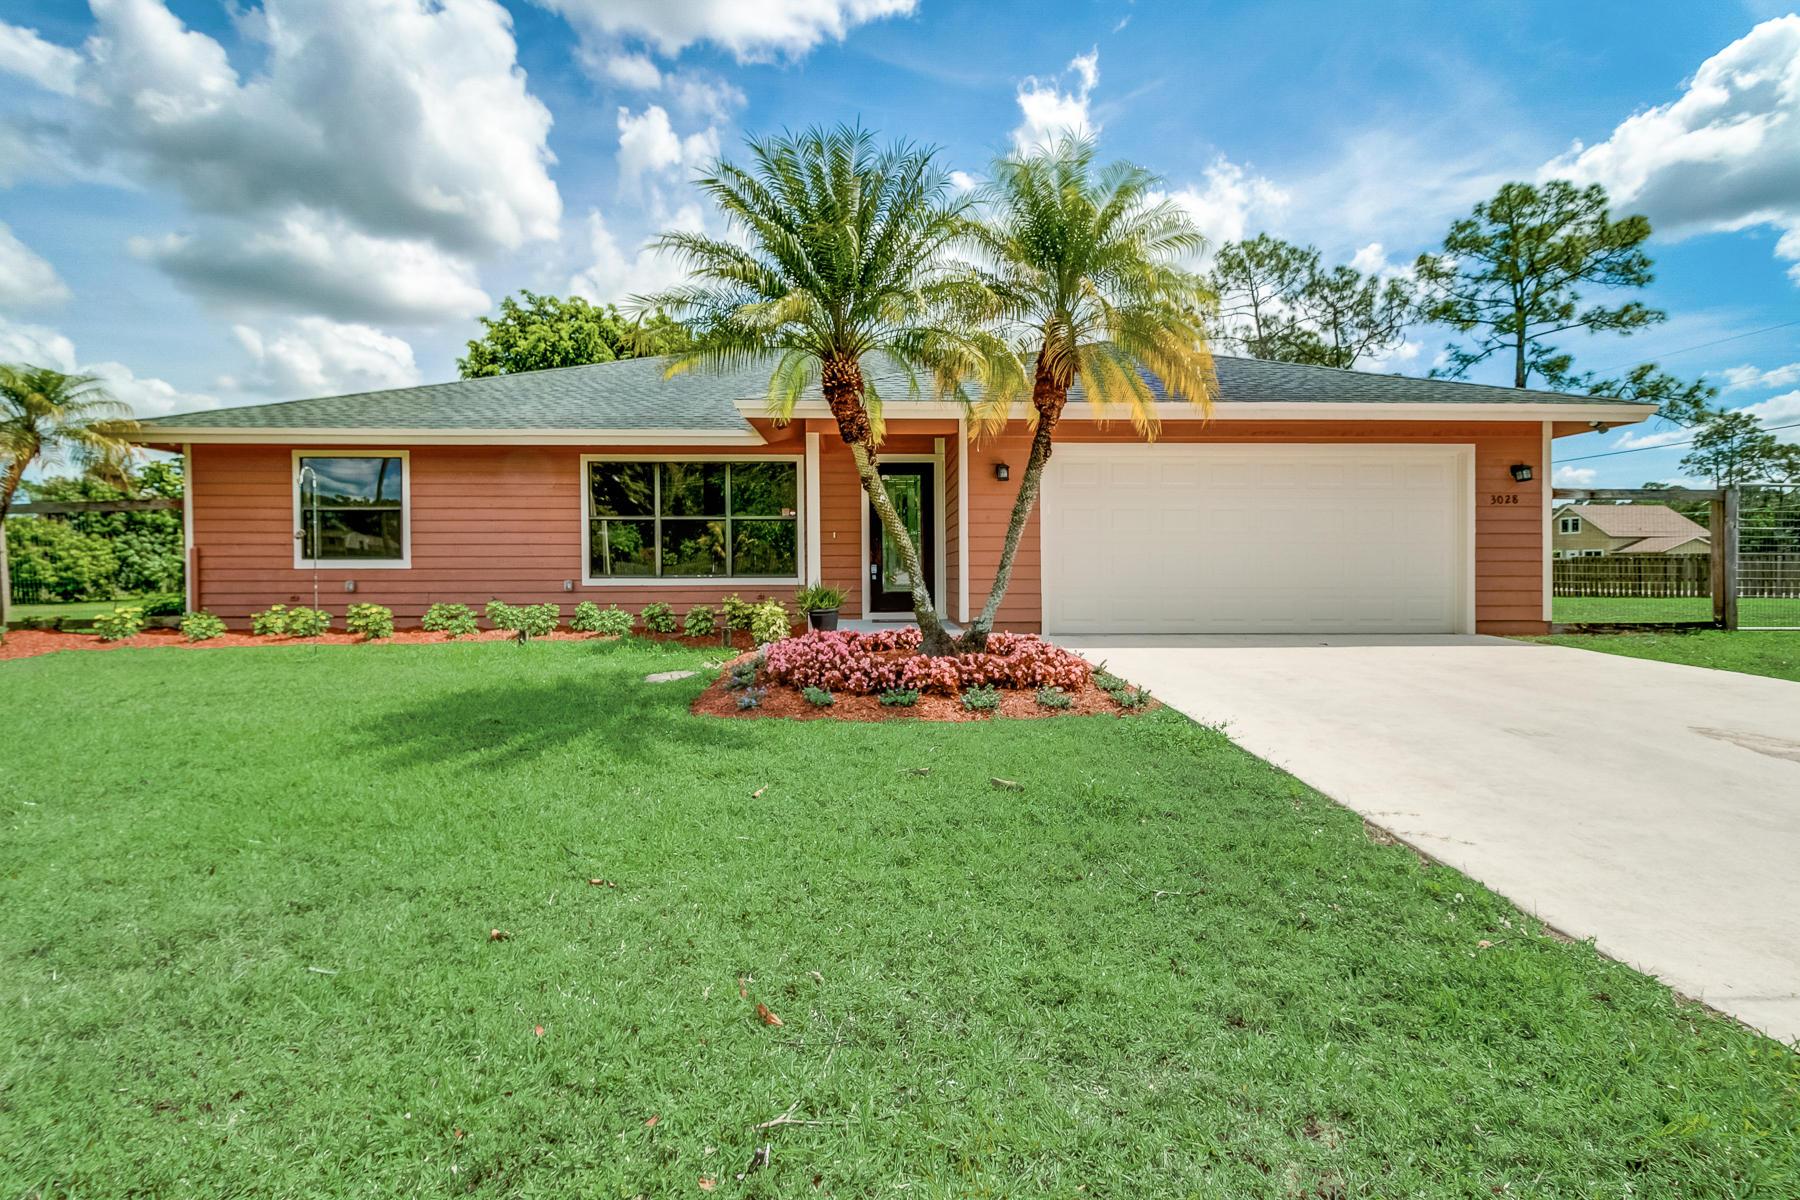 3028 Seminole Pratt Whitney Road, Loxahatchee, Florida 33470, 3 Bedrooms Bedrooms, ,2 BathroomsBathrooms,Single Family,For Sale,Seminole Pratt Whitney,RX-10512720